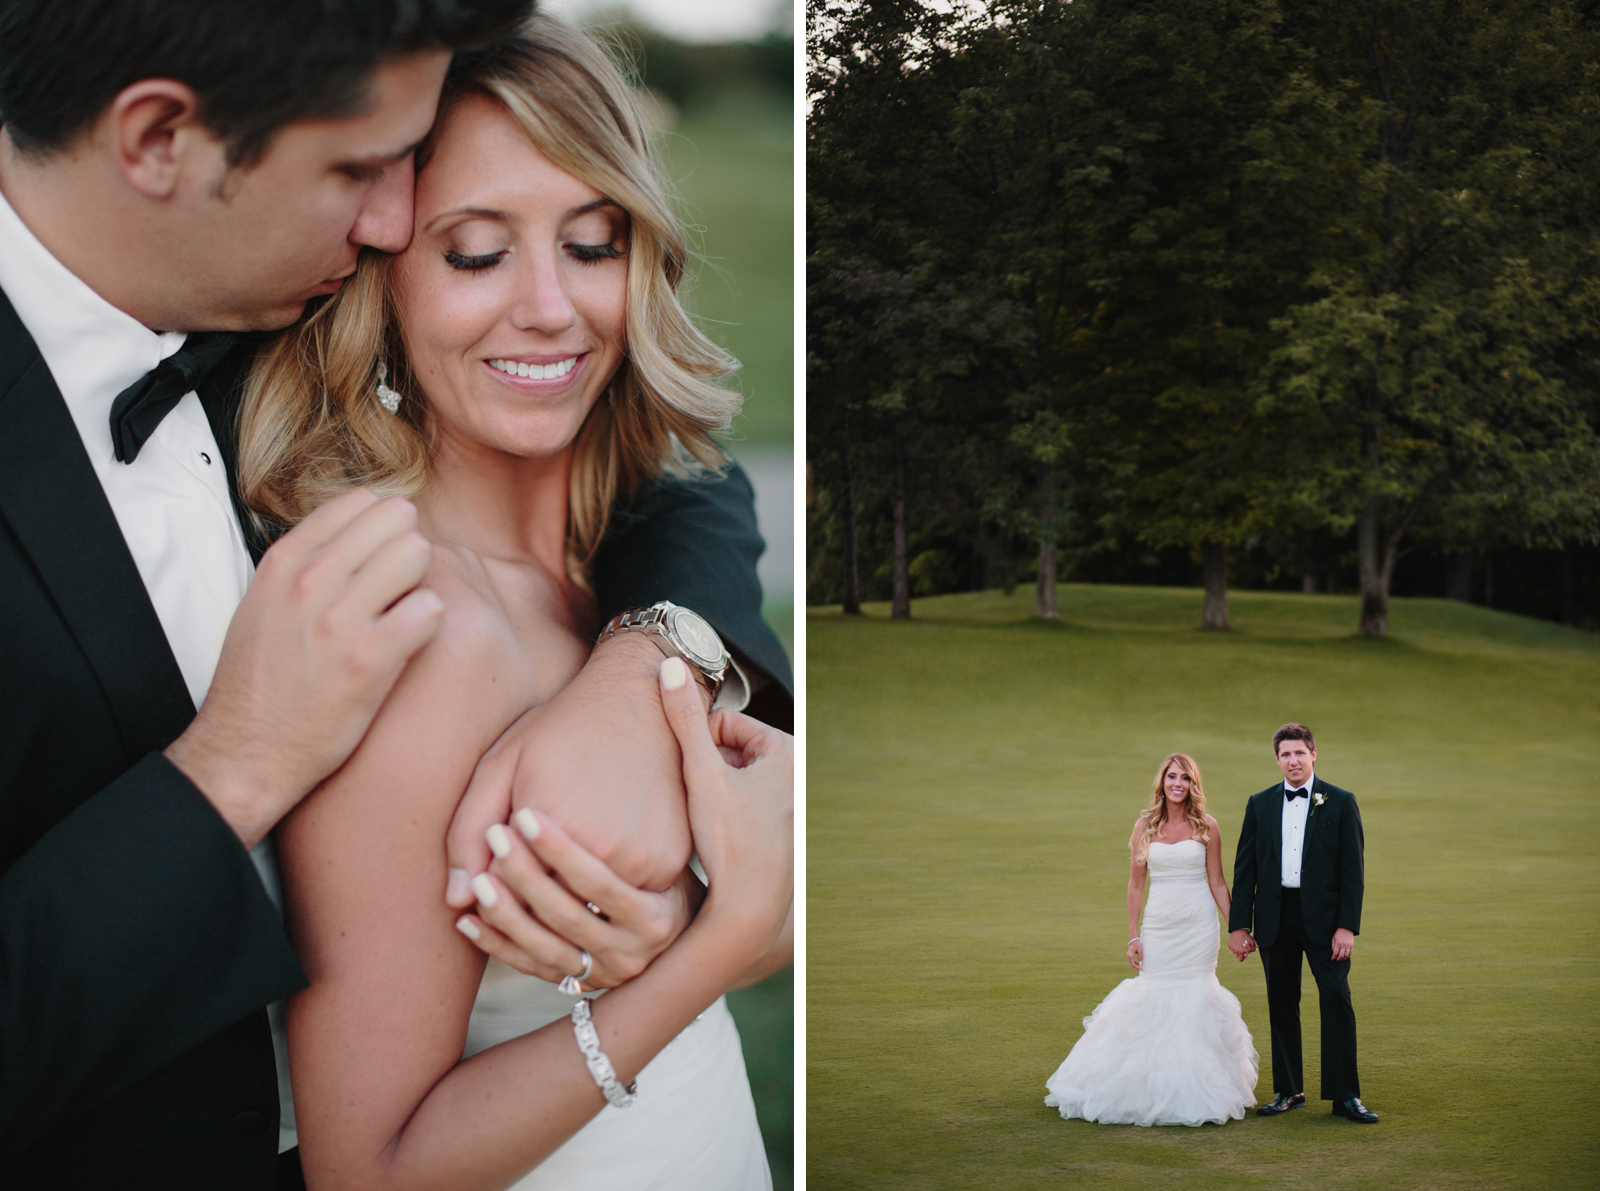 Northern Michigan Grand Traverse Resort Black Tie Wedding Photographer - Codee and Aaron-030.jpg